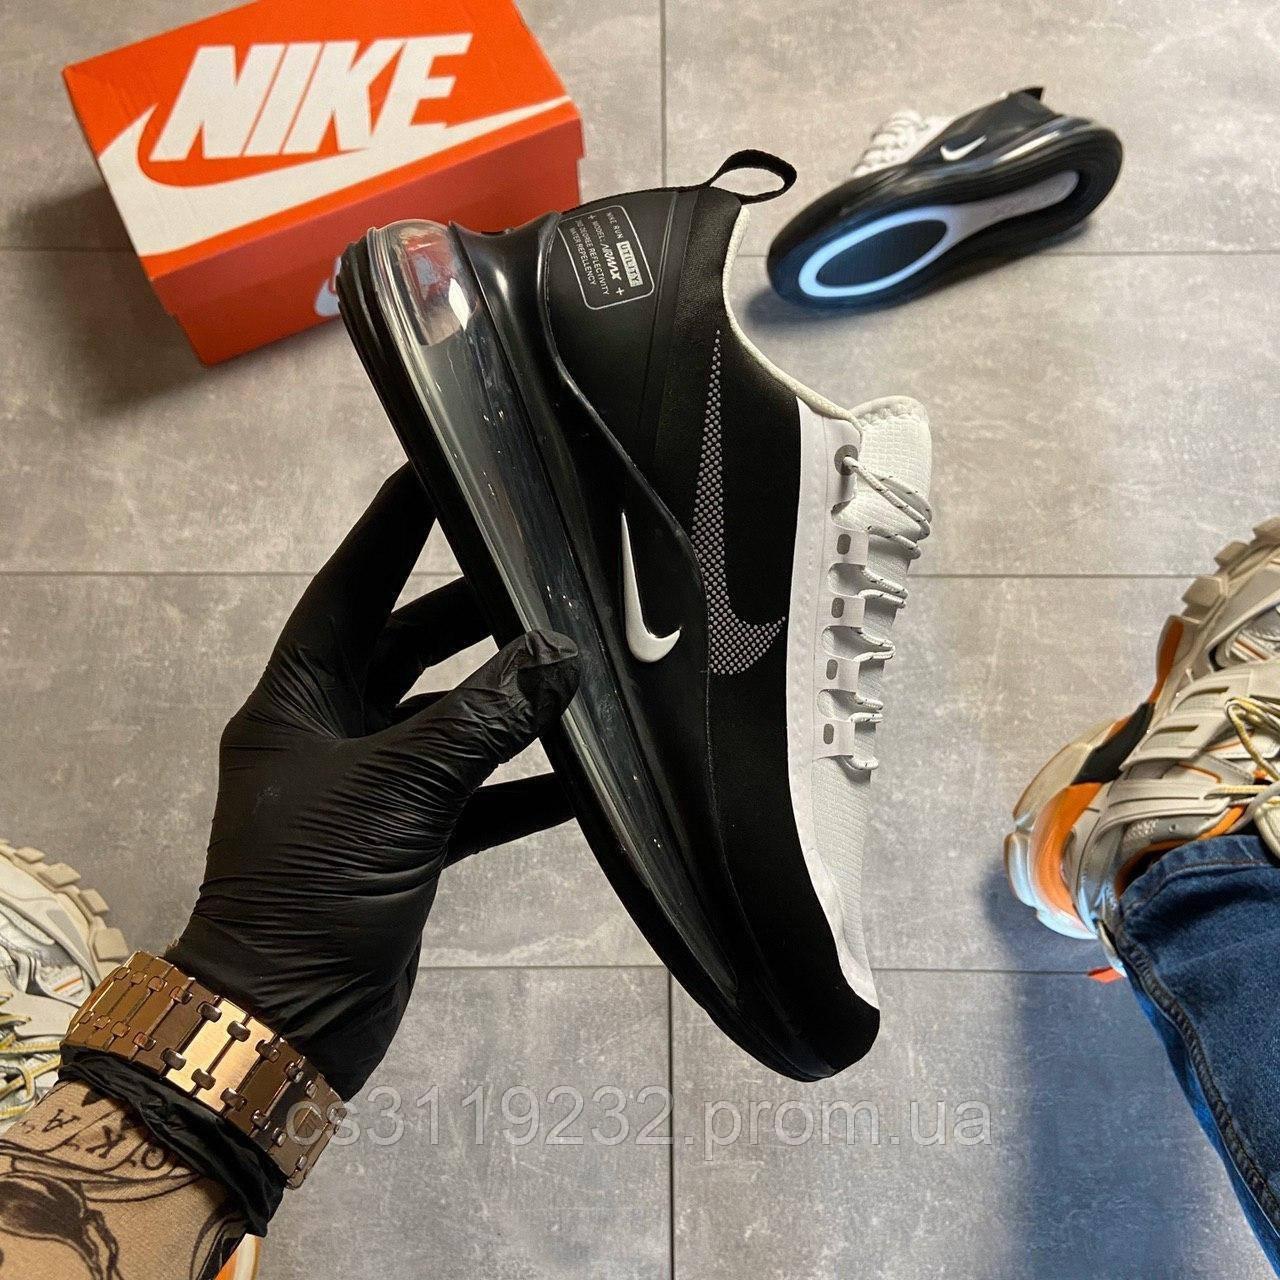 Мужские кроссовки Nike Air Max 720 Utility Black/White (черно-белые)